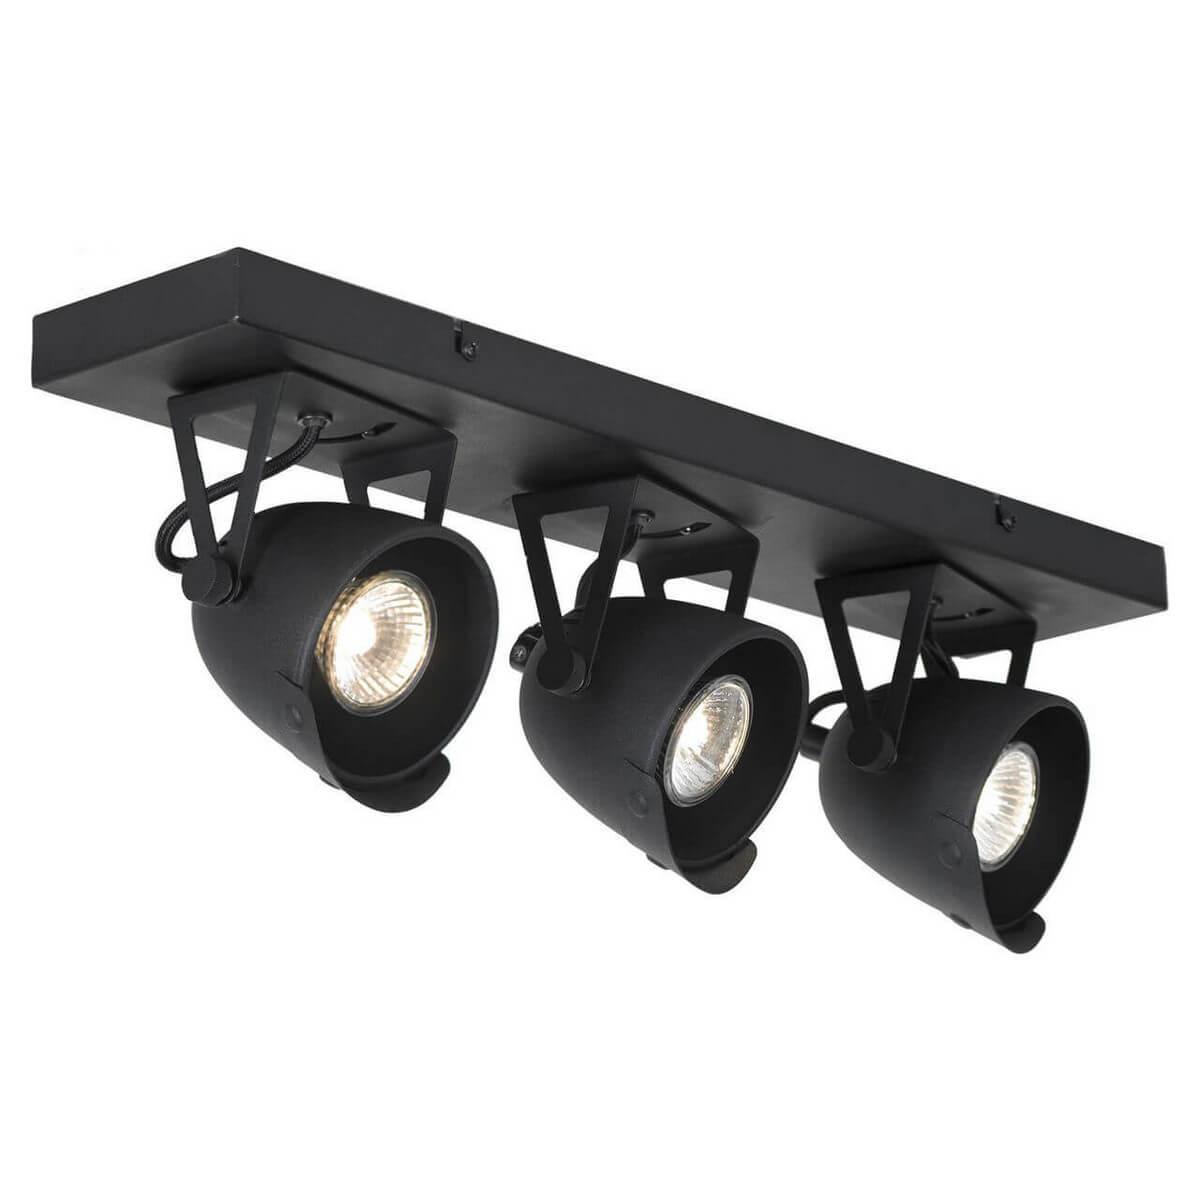 Спот Lussole LOFT GRLSP-9507, GU10, 5,5 Вт loft